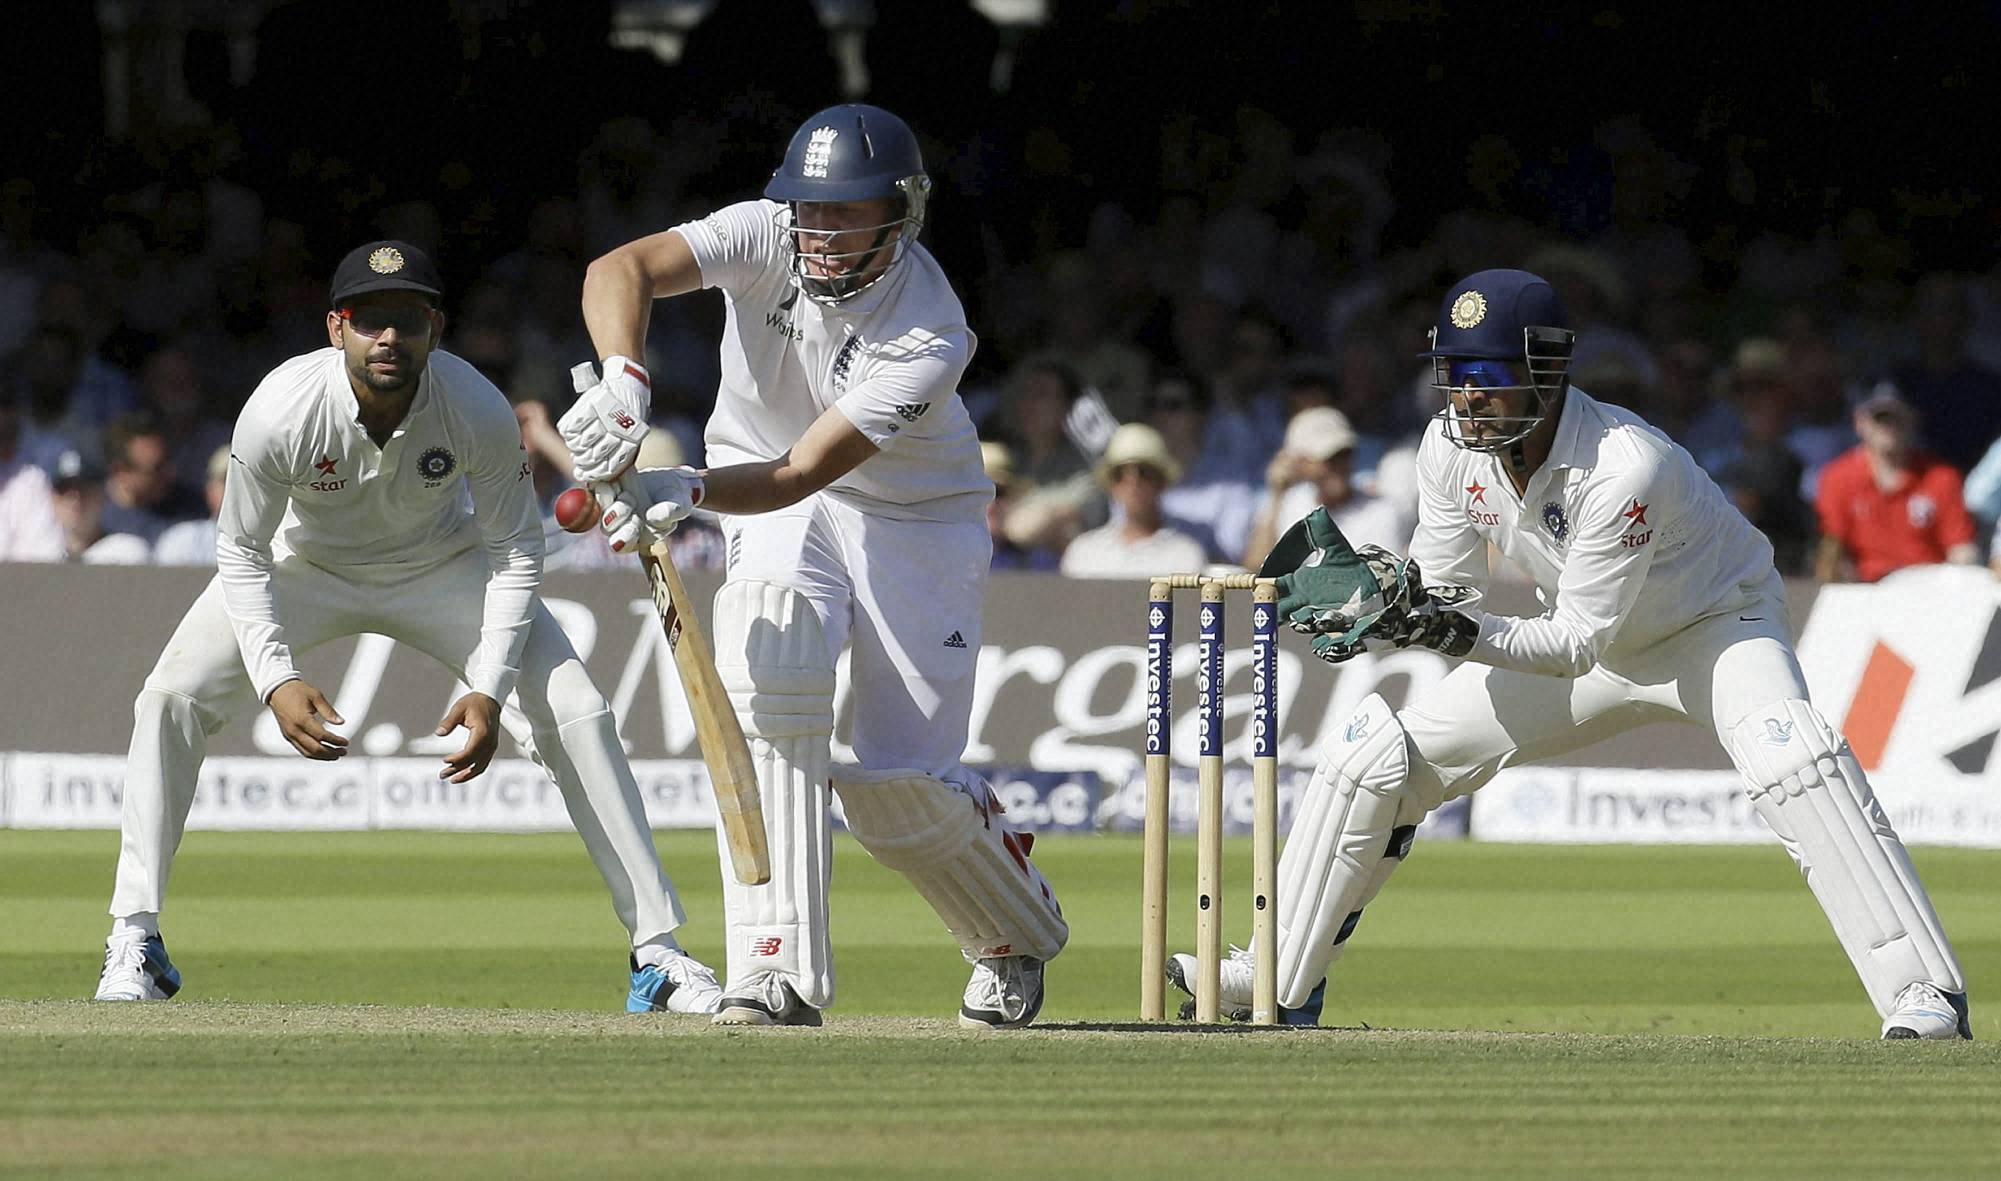 Gary Ballance, Moeen Ali, Joe Root, plays, shot off, Stuart Binny, Ishant Sharma, India's, Ravindra Jadeja, fails, stop ball,England's, Ian Bell, India's, Bhuvneshwar Kumar, second day, second test match, England, India, Lord's, cricket, London